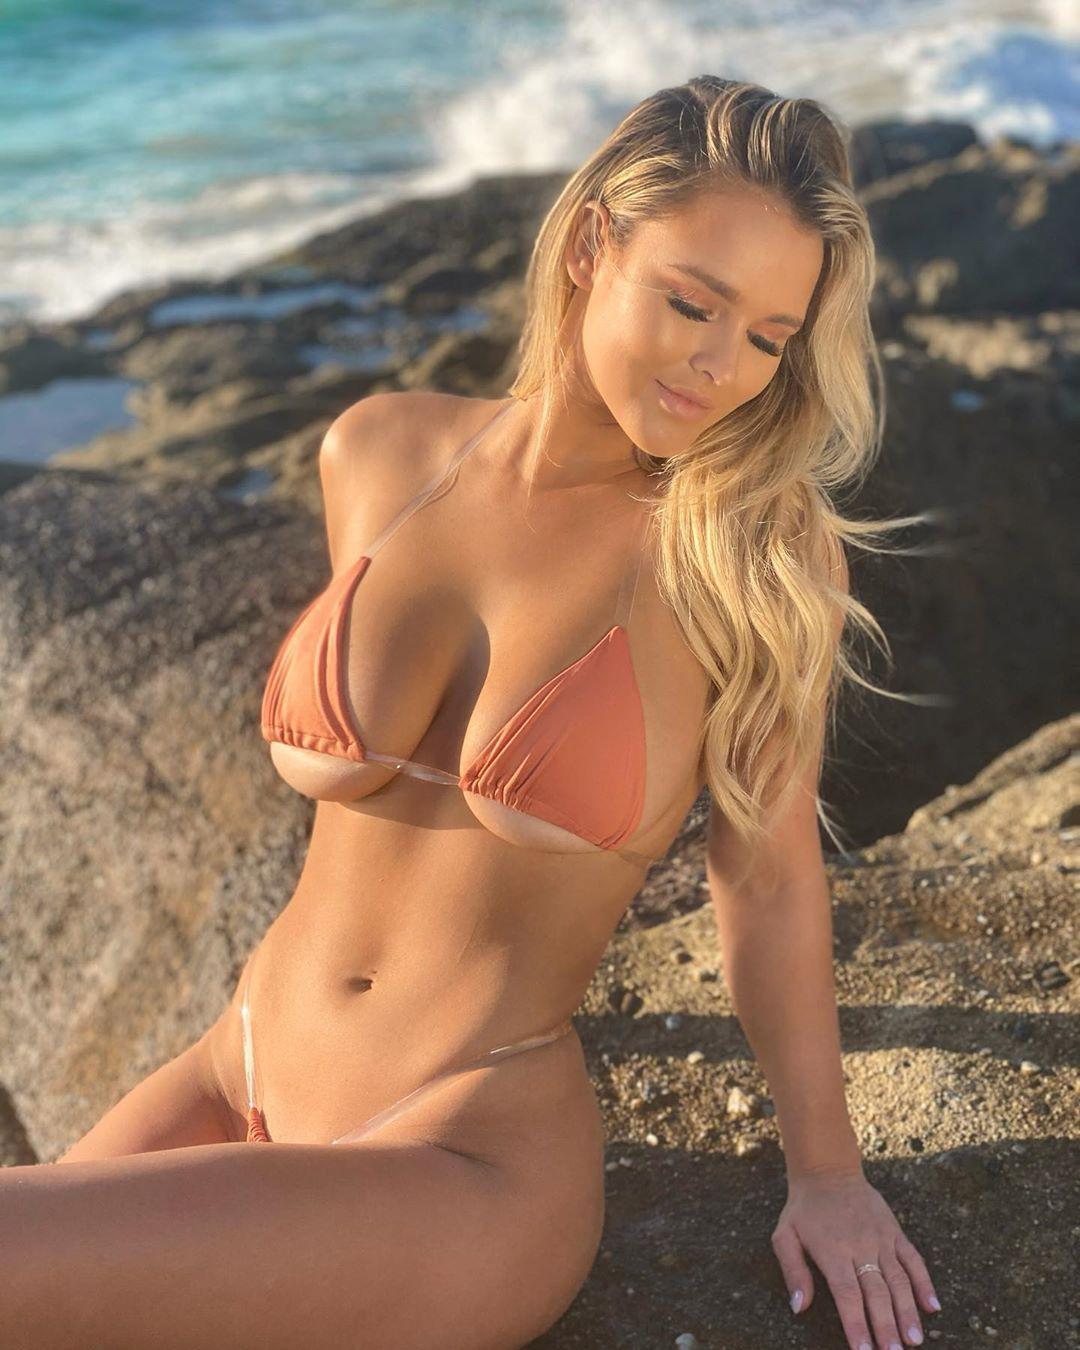 Kinsey Golden nude   FitNakedGirls.com